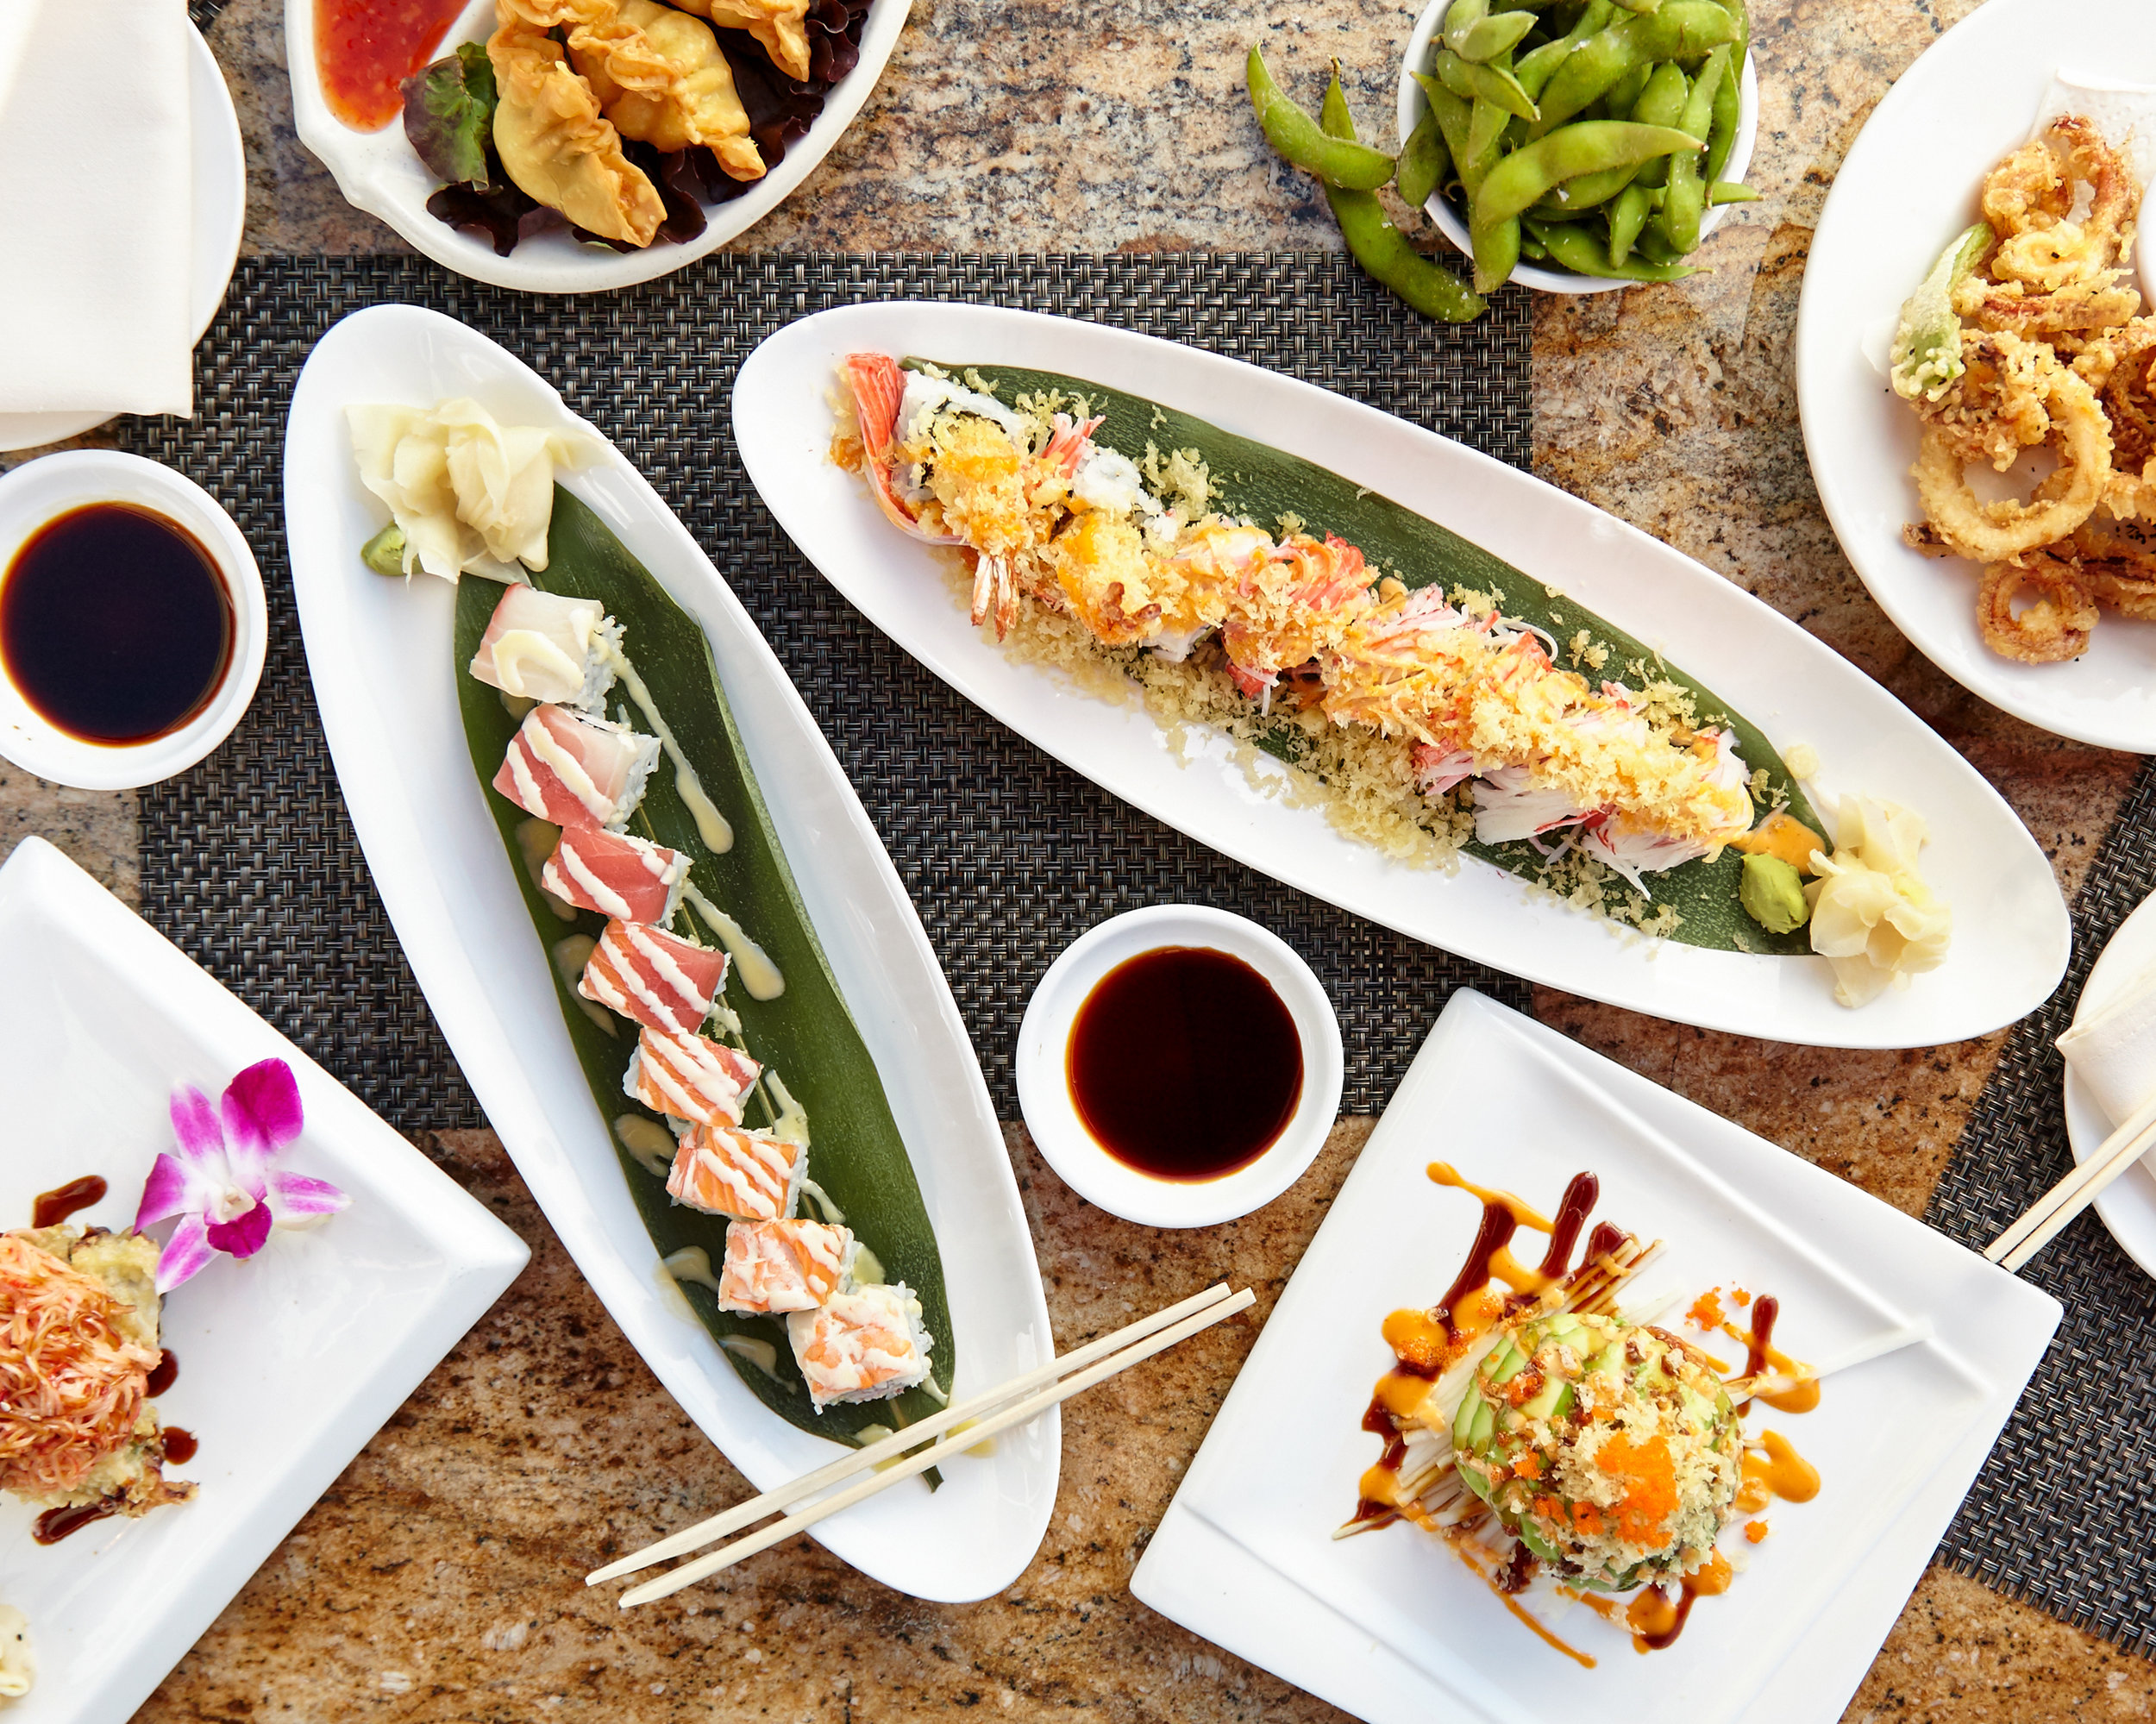 <style> .cincinnati ichiban sushi photography { display: none } </style>